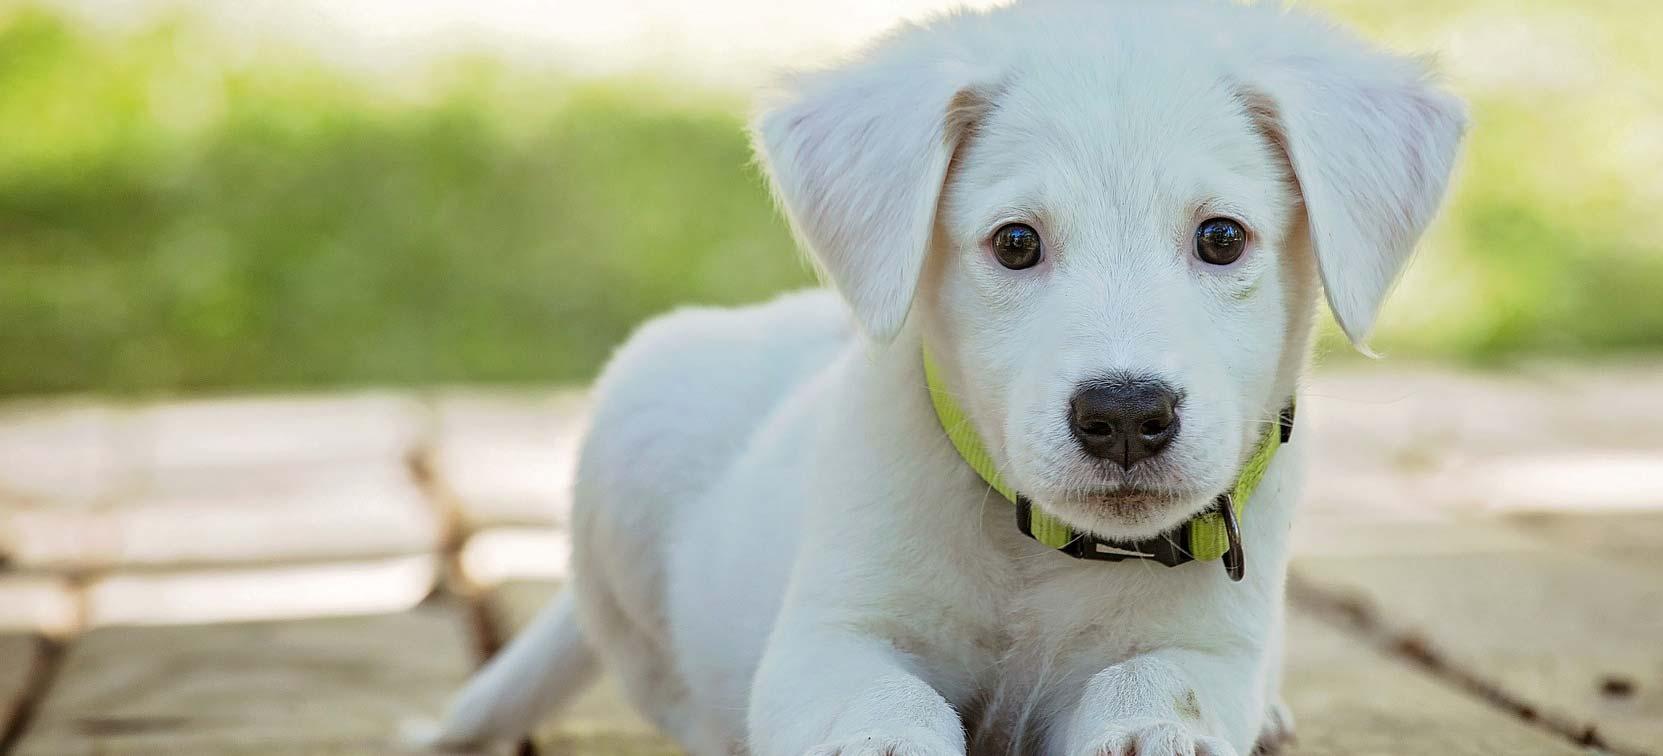 Honden Dier Medisch Centrum Goor